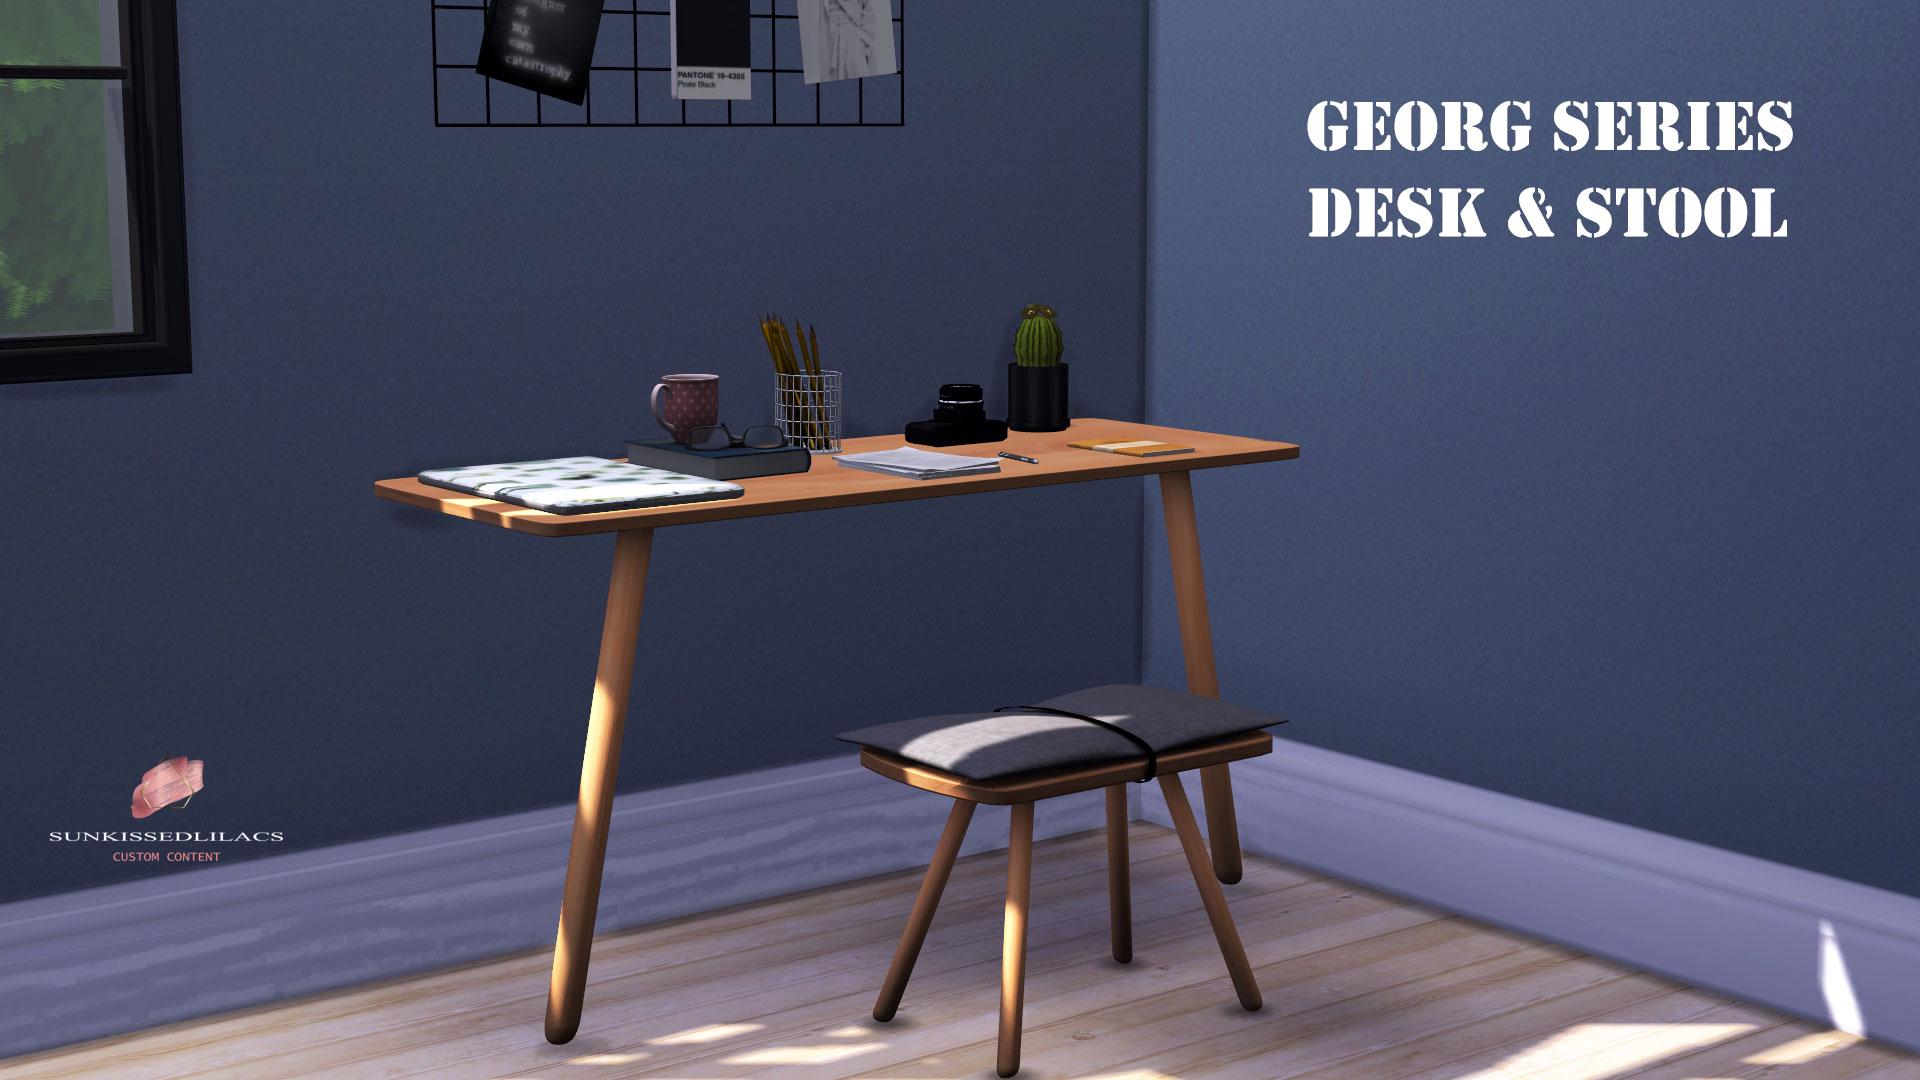 Georg Series Desk & Stool